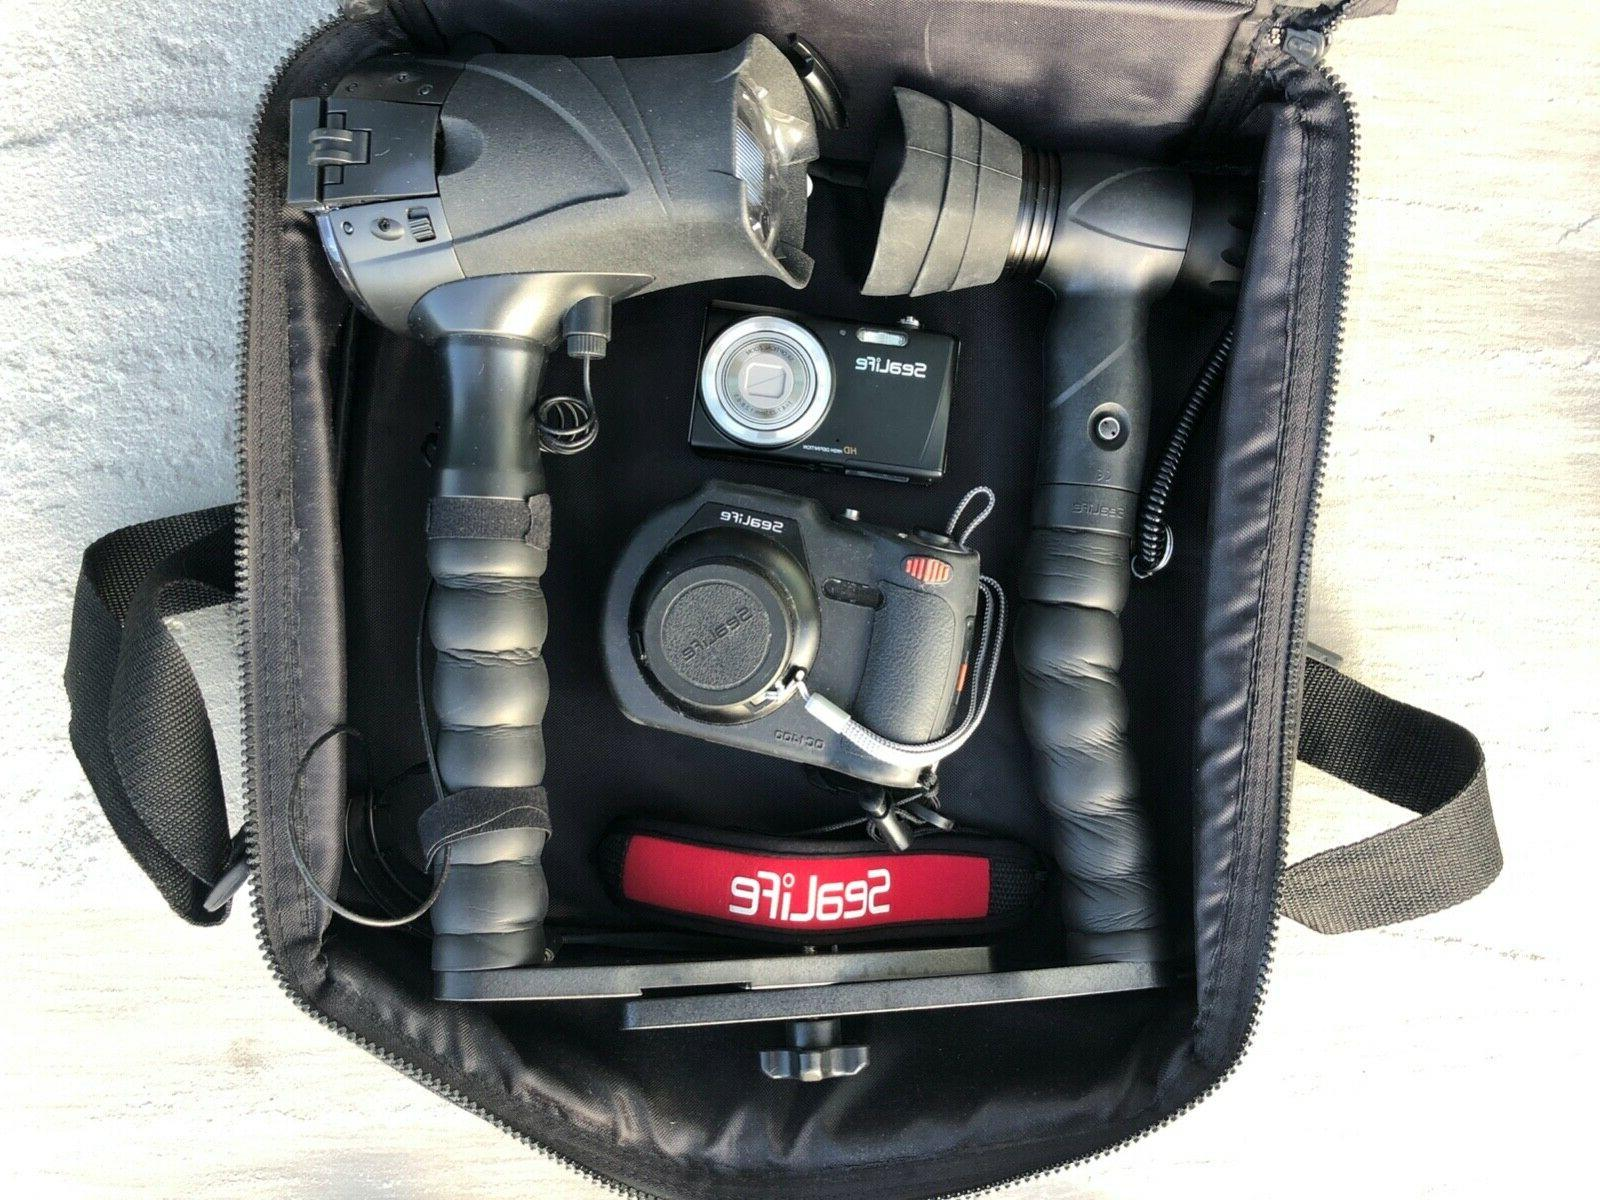 dc1400 underwater camera with digital flash